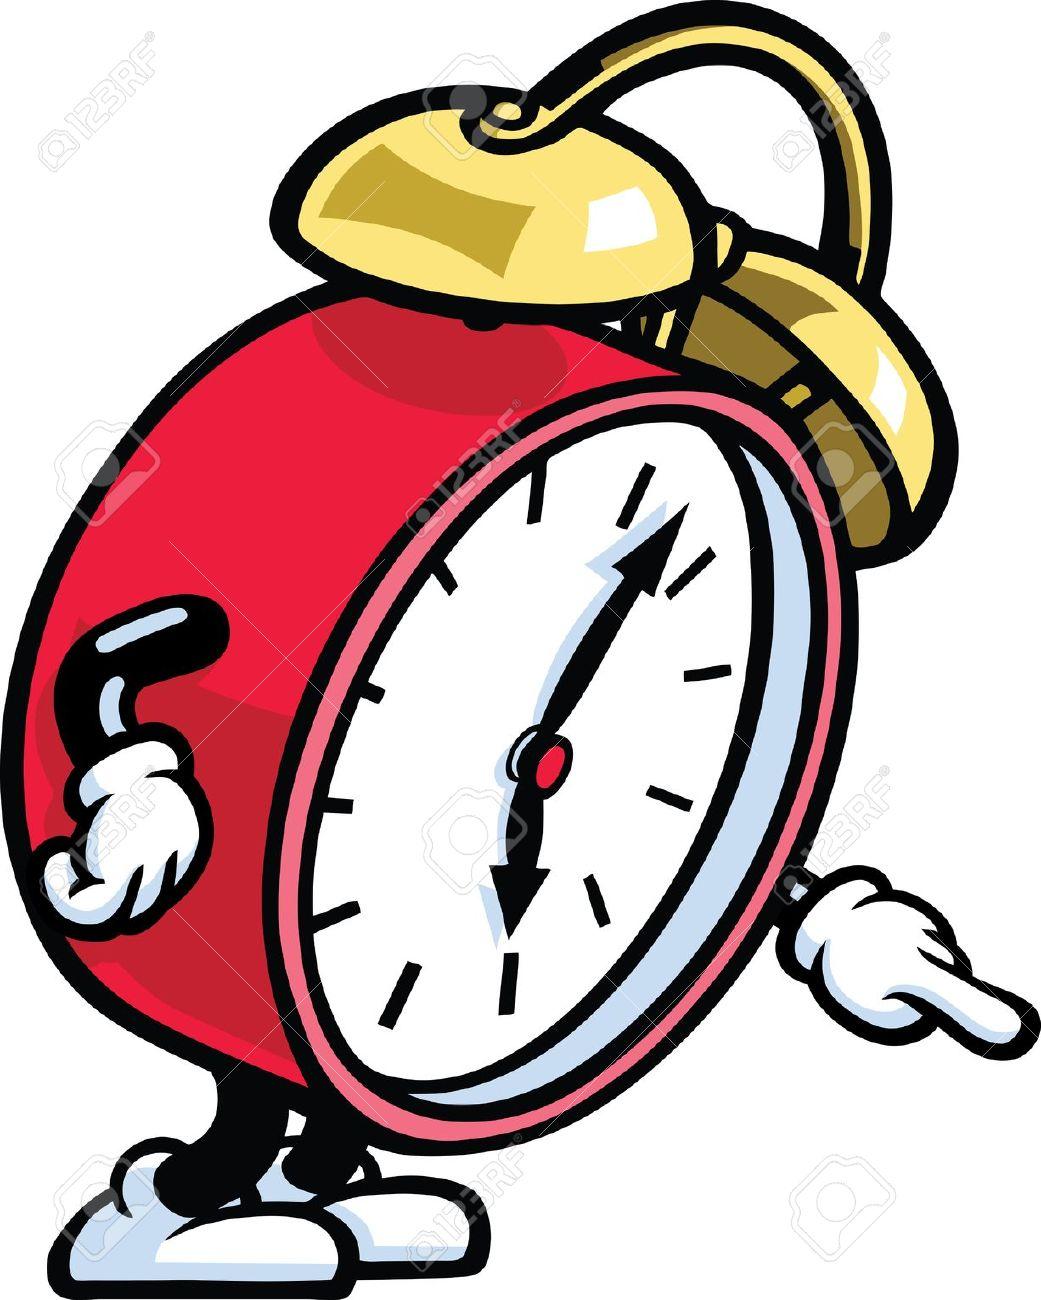 1041x1300 Animated Alarm Clock Clipart